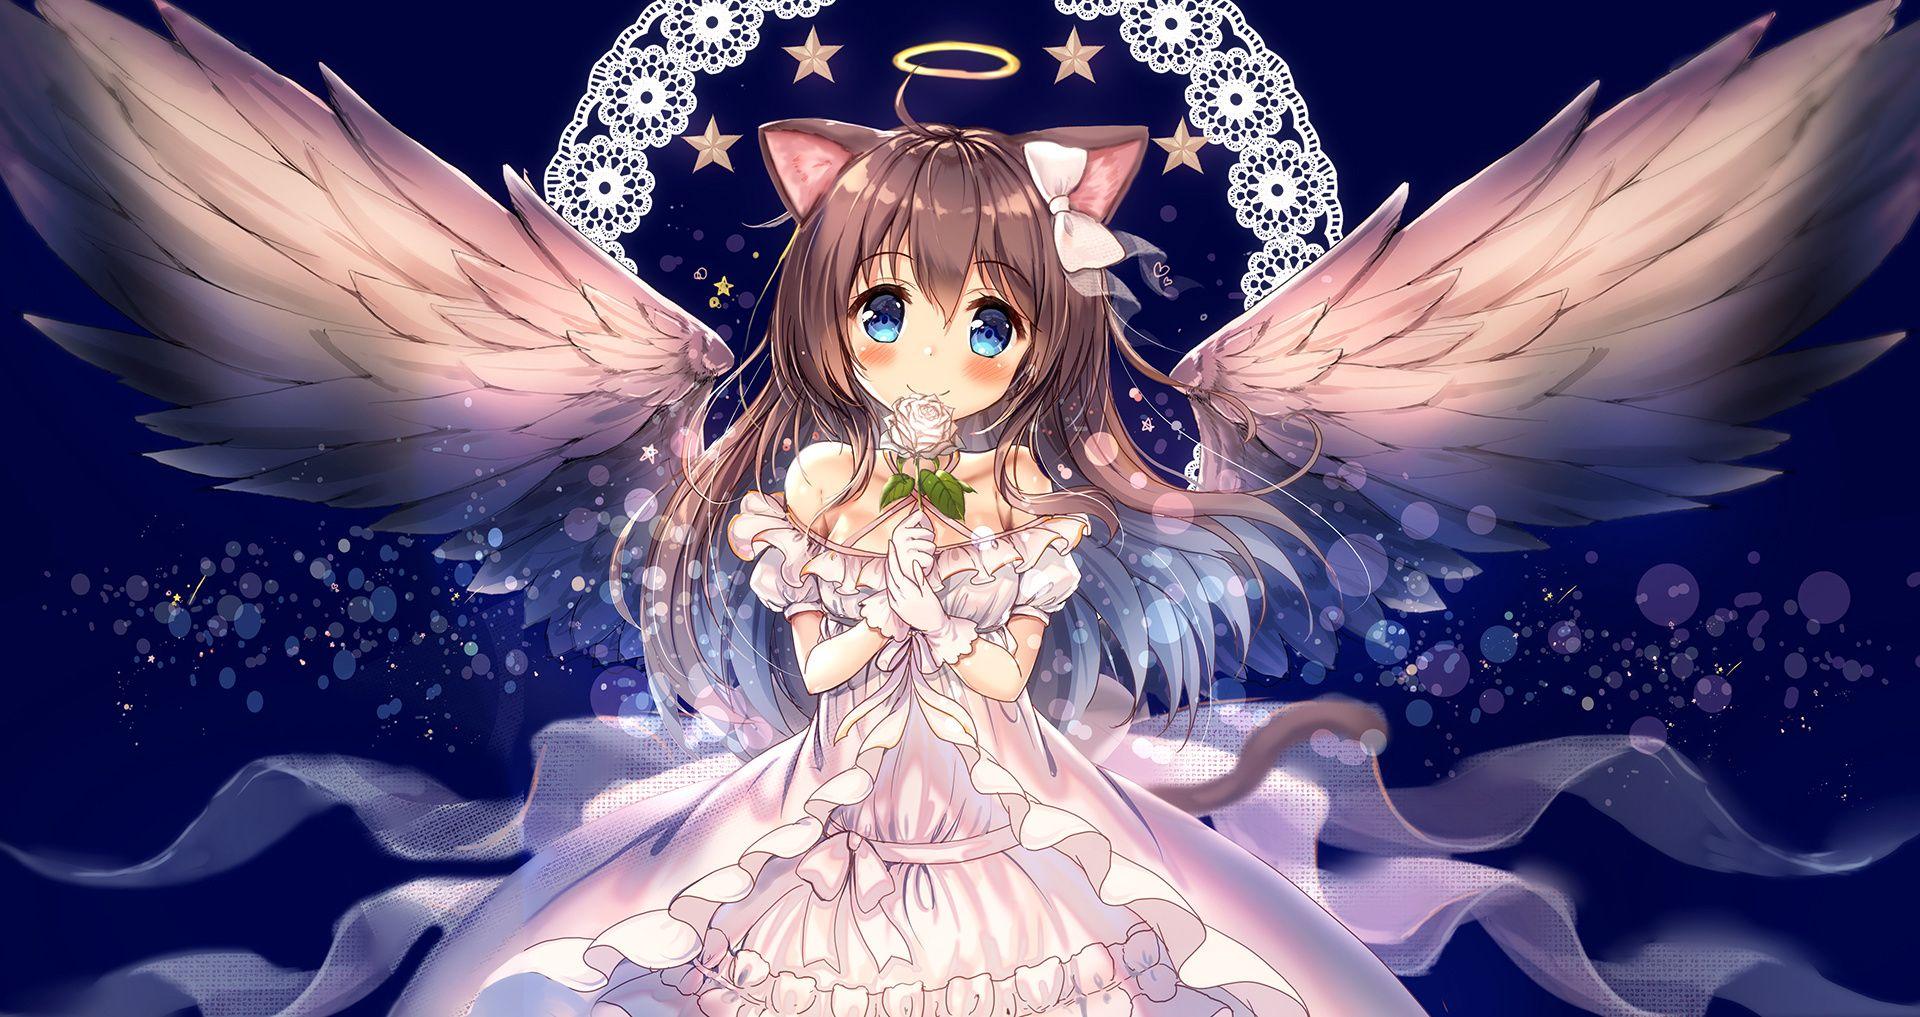 Cute Emo Wallpapers For Iphone Desktop Wallpaper Cute Anime Girl Angel Girl Wings Hd